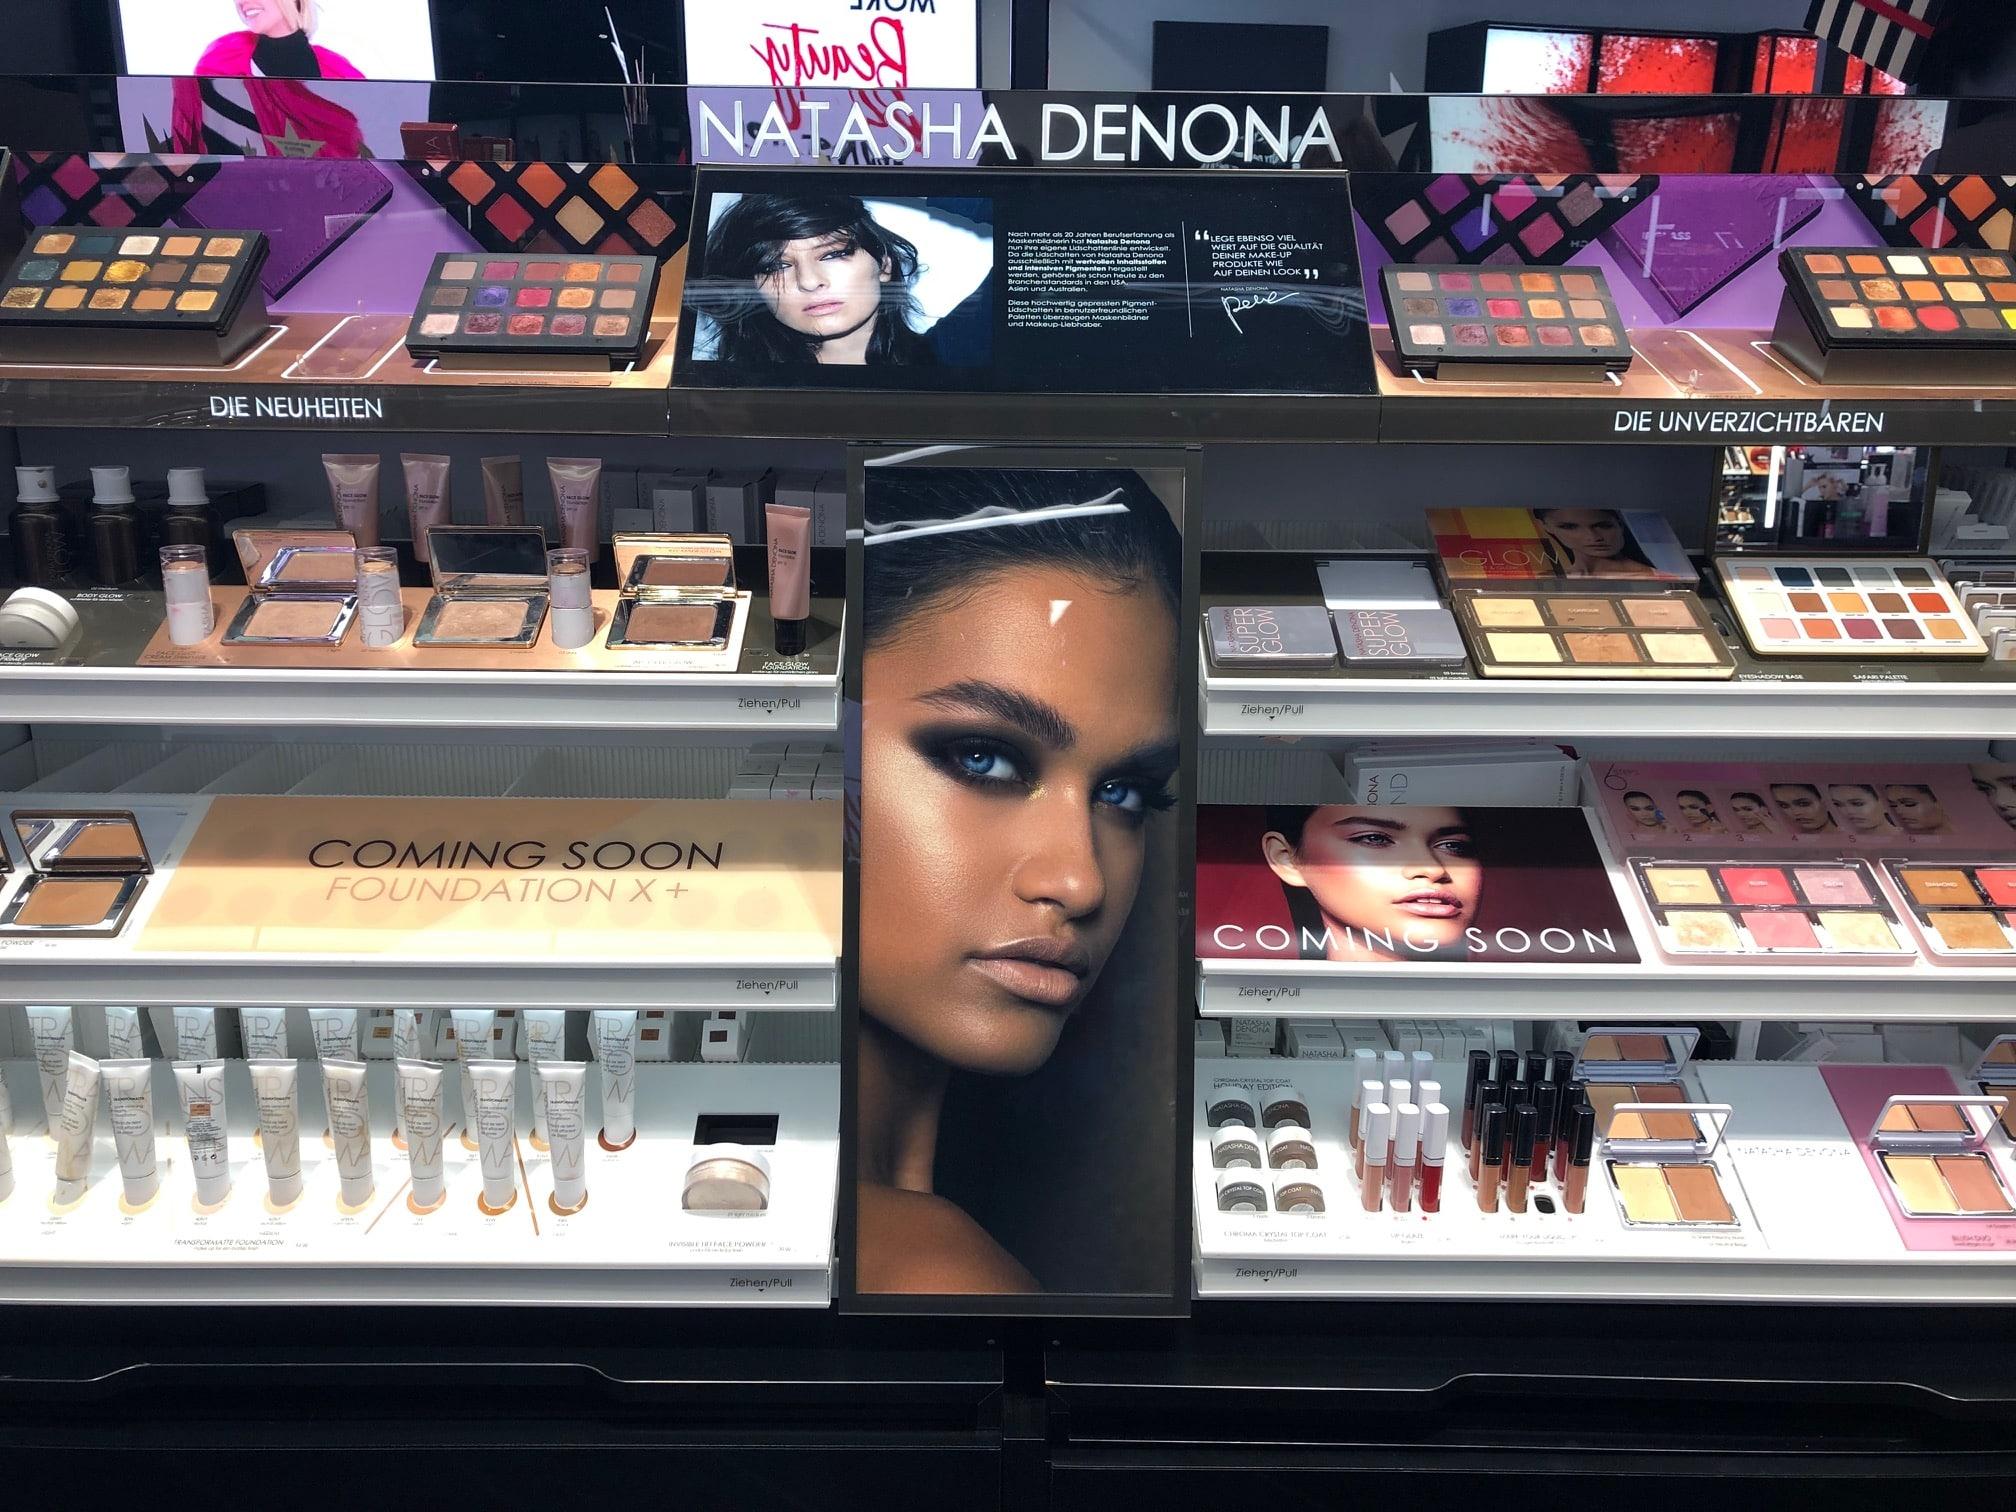 Frankfurt beauty shopping guide, 20 edition   twindly beauty blog